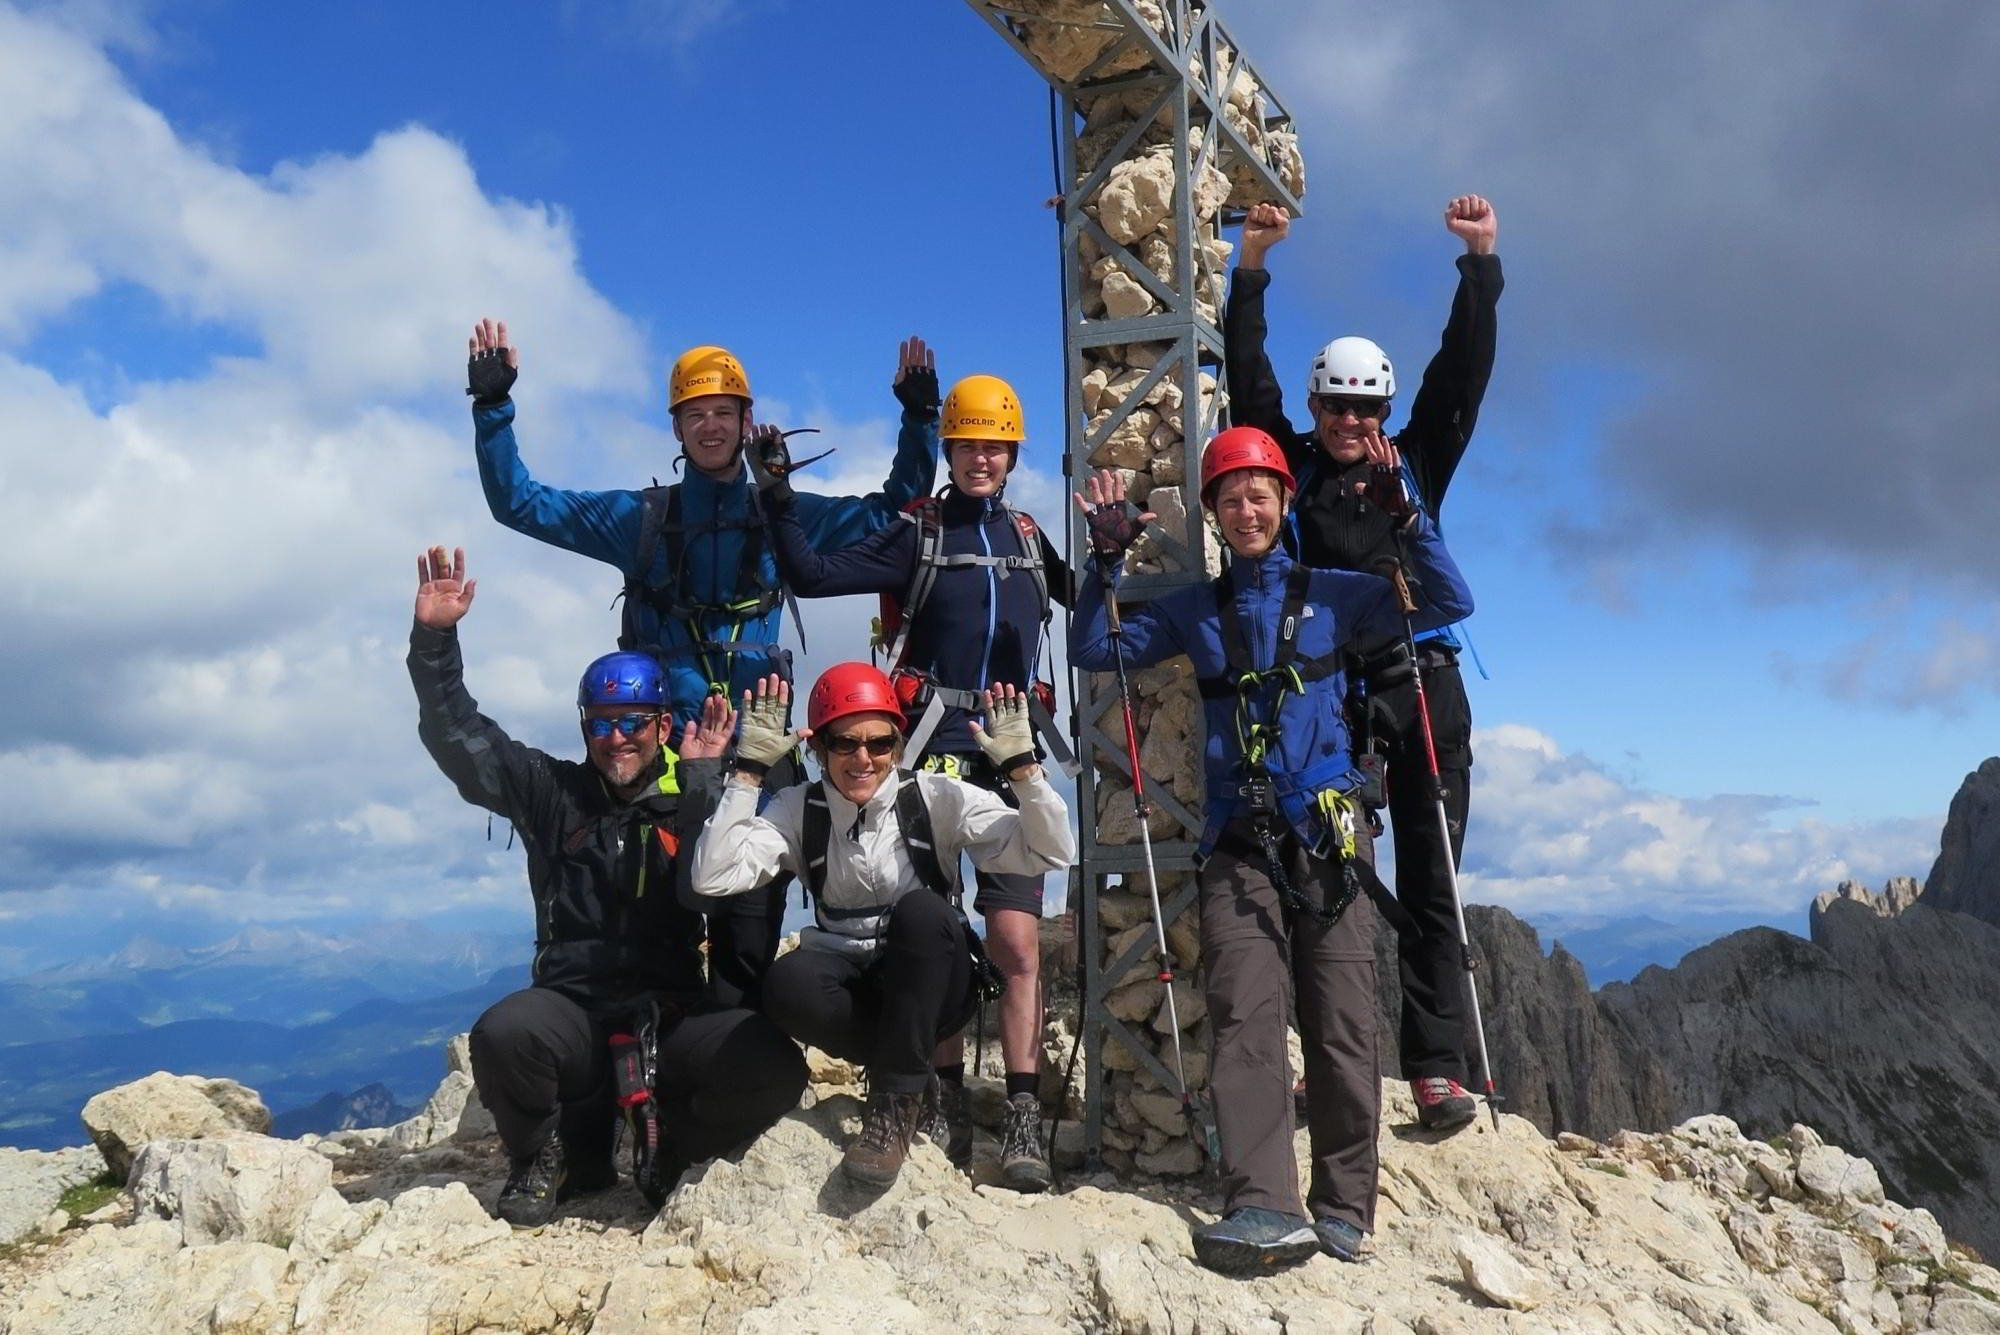 Klettersteig Rosengarten : Traum klettersteige im rosengarten in den dolomiten